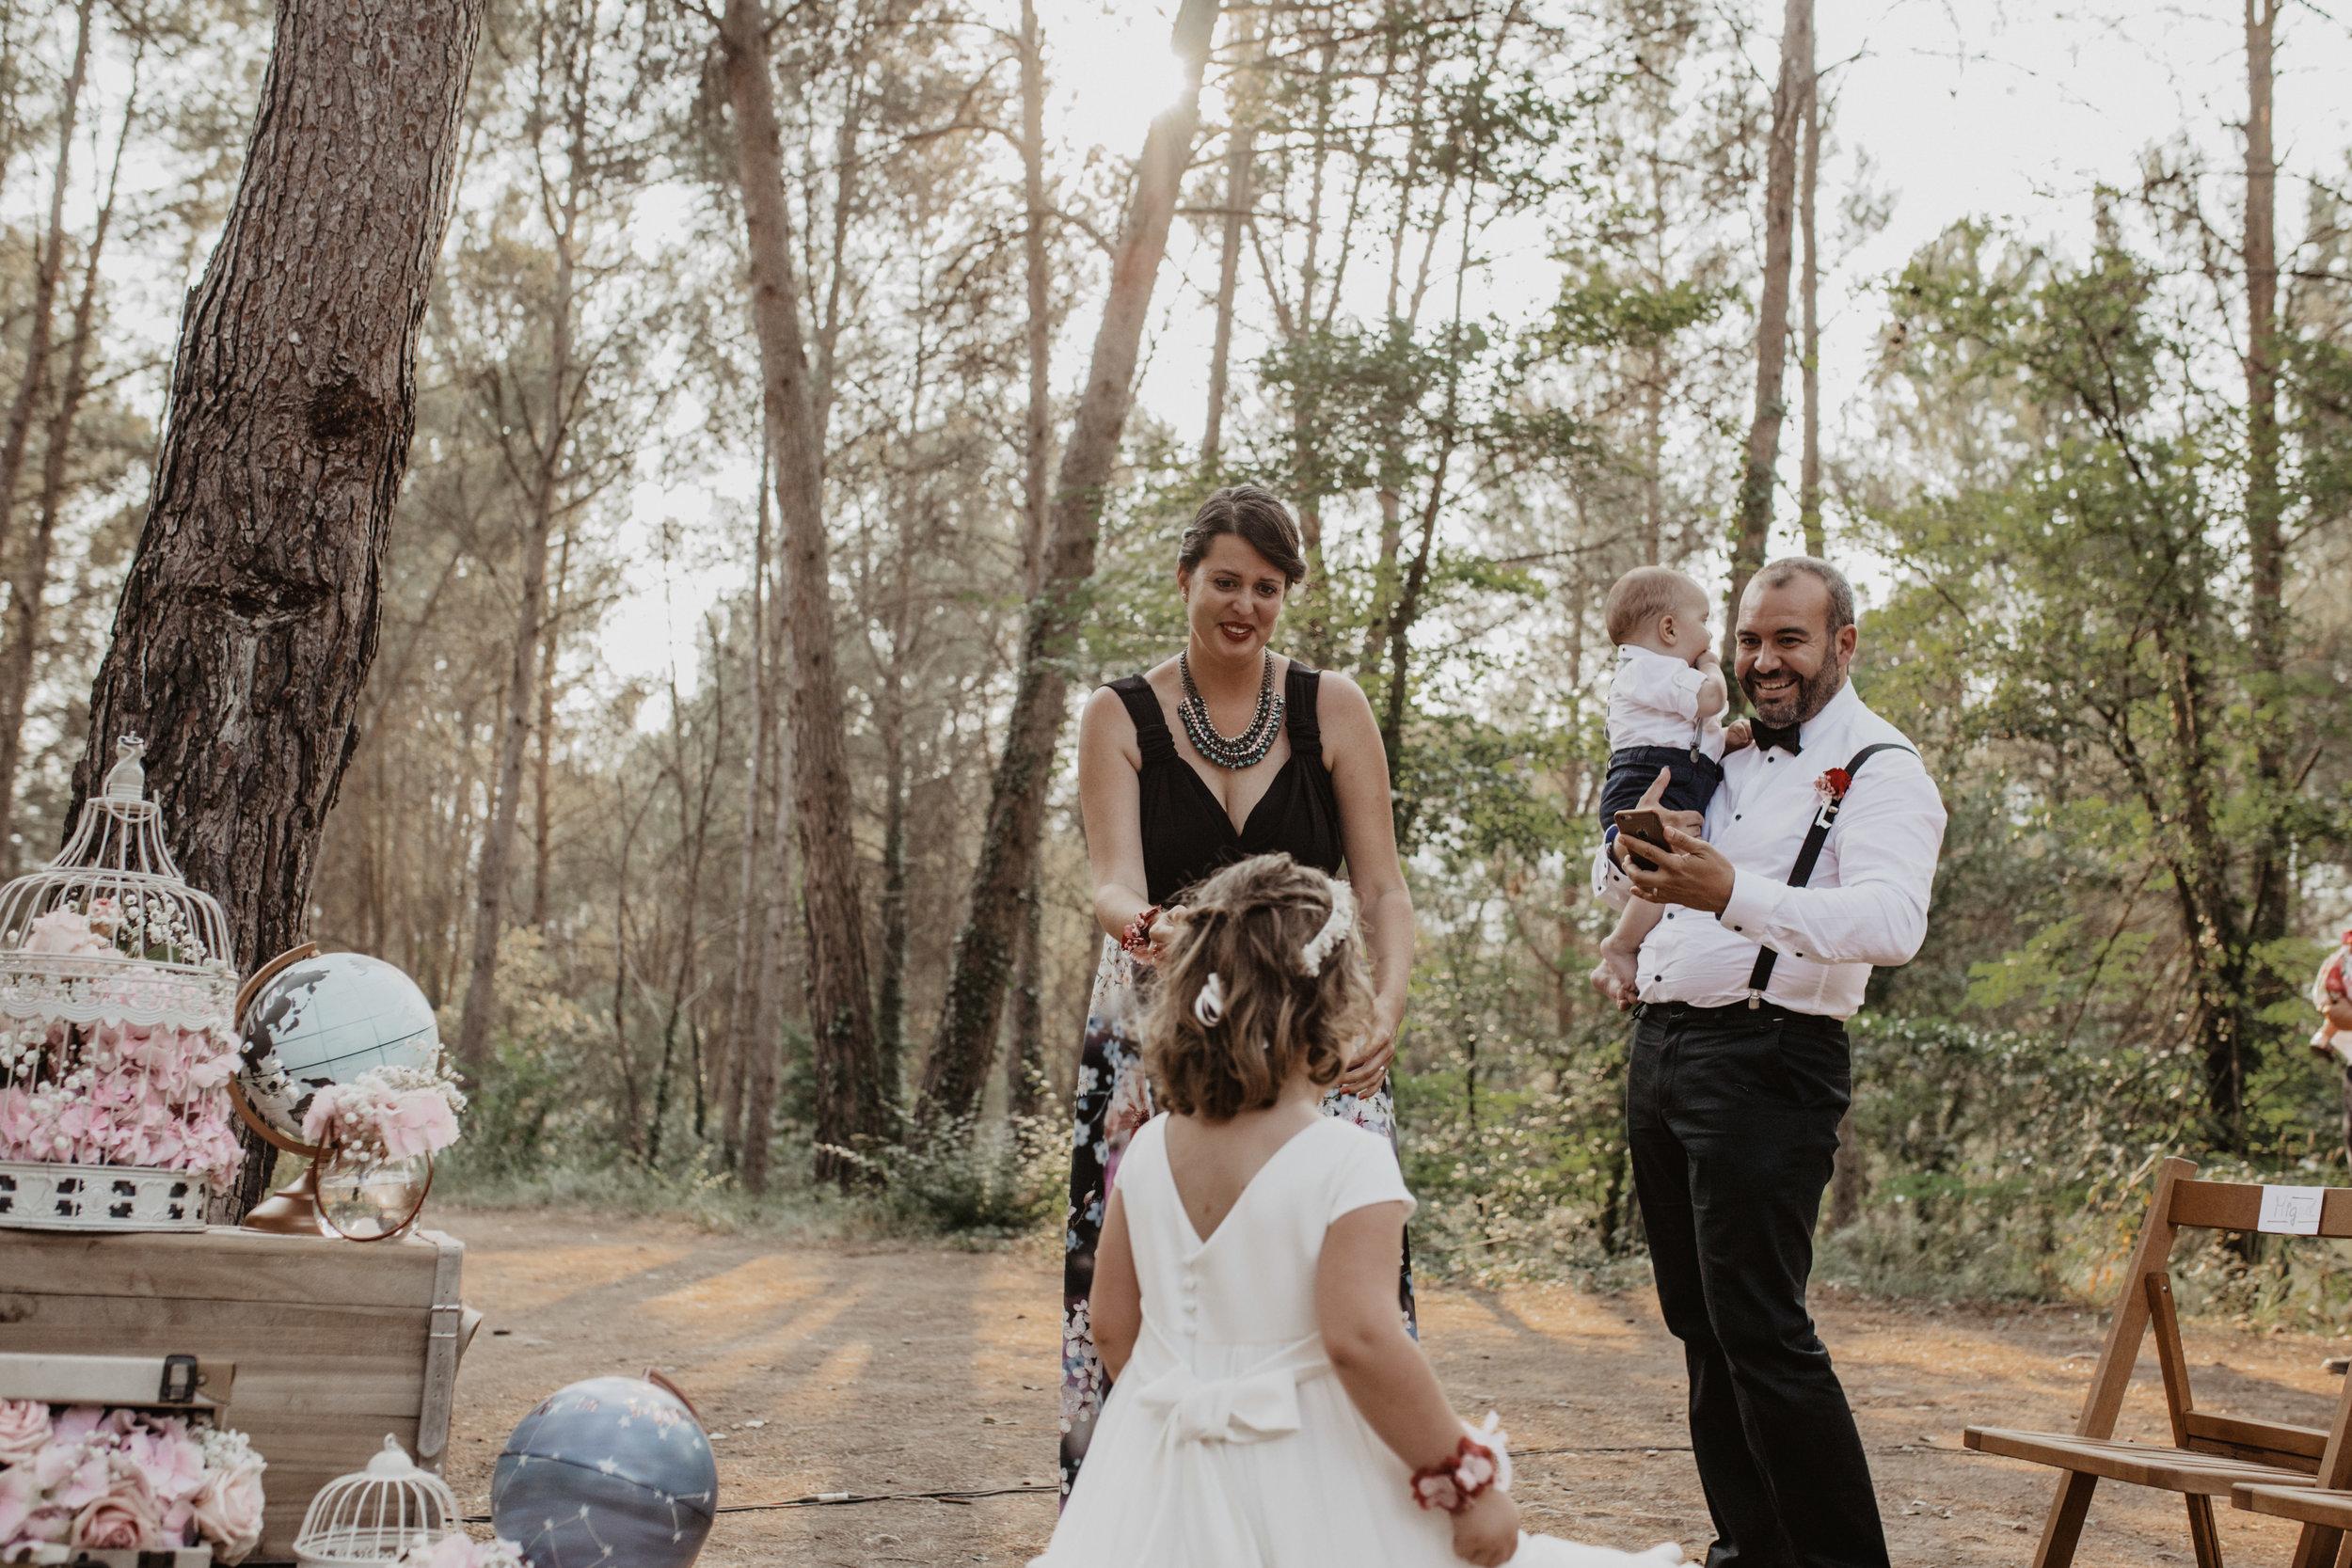 thenortherngirlphotography_photography_thenortherngirl_rebeccascabros_wedding_weddingphotography_masialagarrigadecastelladral_joaniemma_bodaenbarcelona_weddingphotographer_emmaijoan-382.jpg